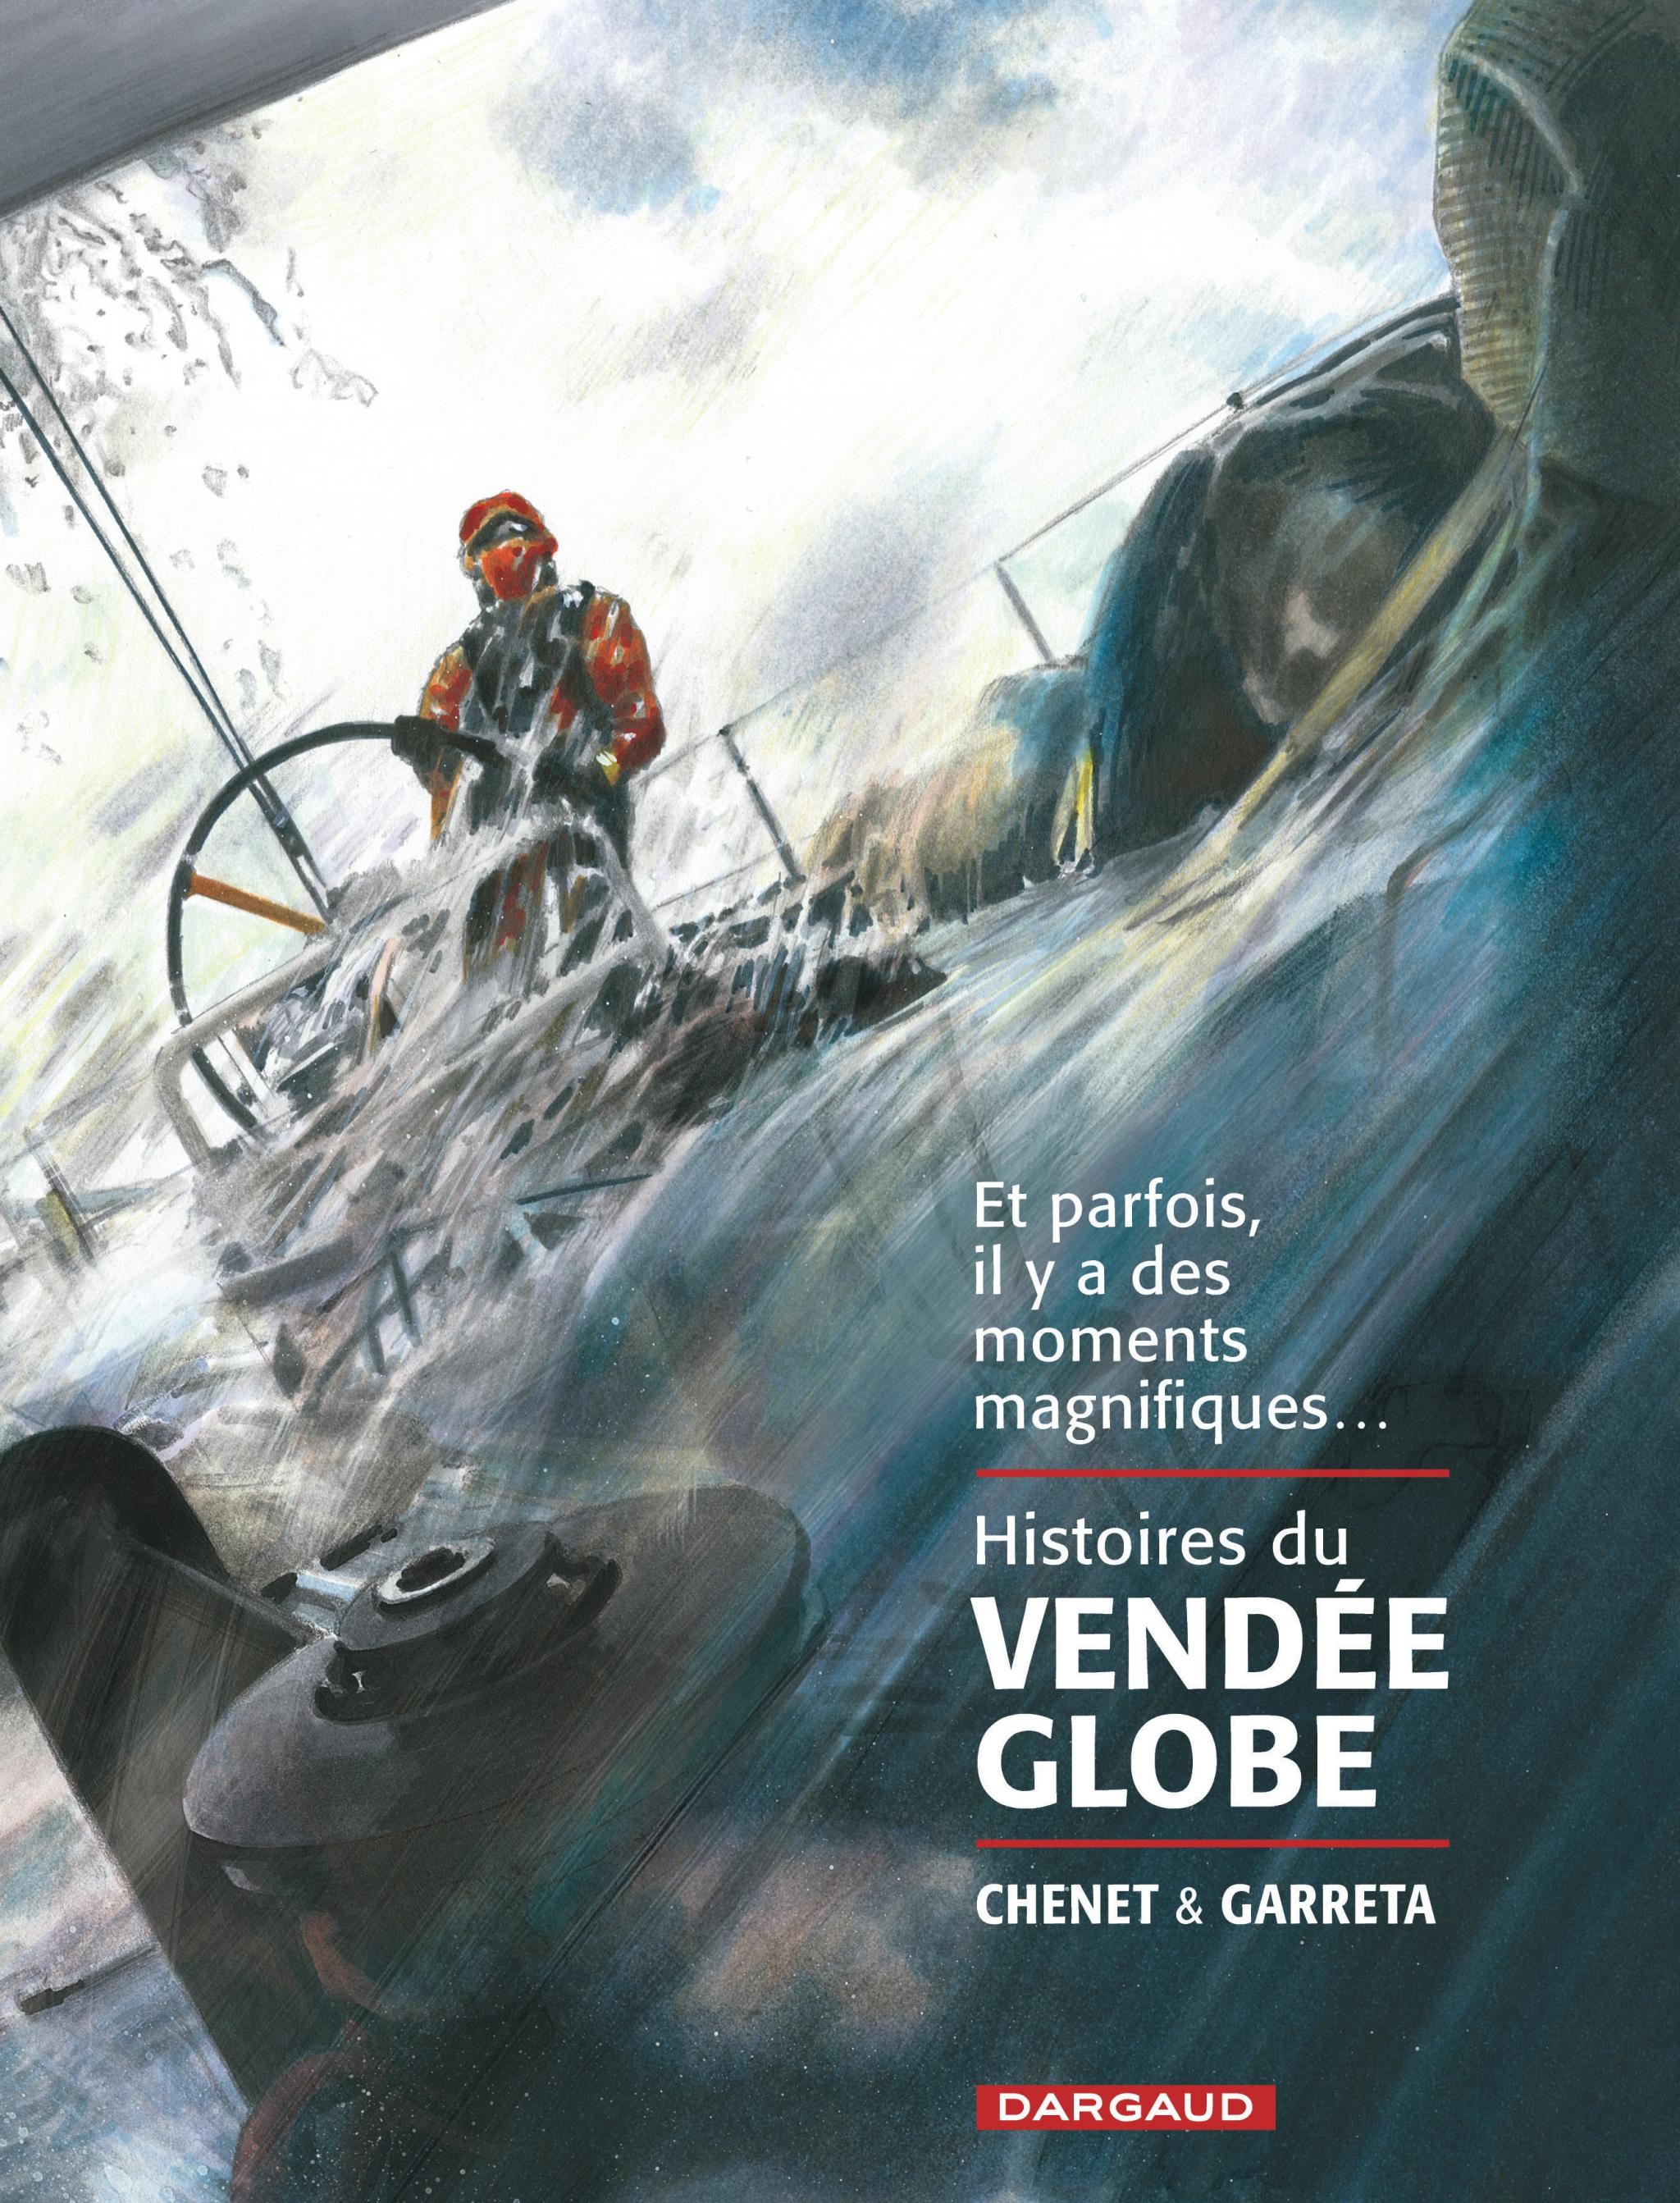 album,bd,histoires,course au large,compétition,vendee globe,du vendee globe renaud garreta,dessins,alexandre chenet,scenario,dargaud